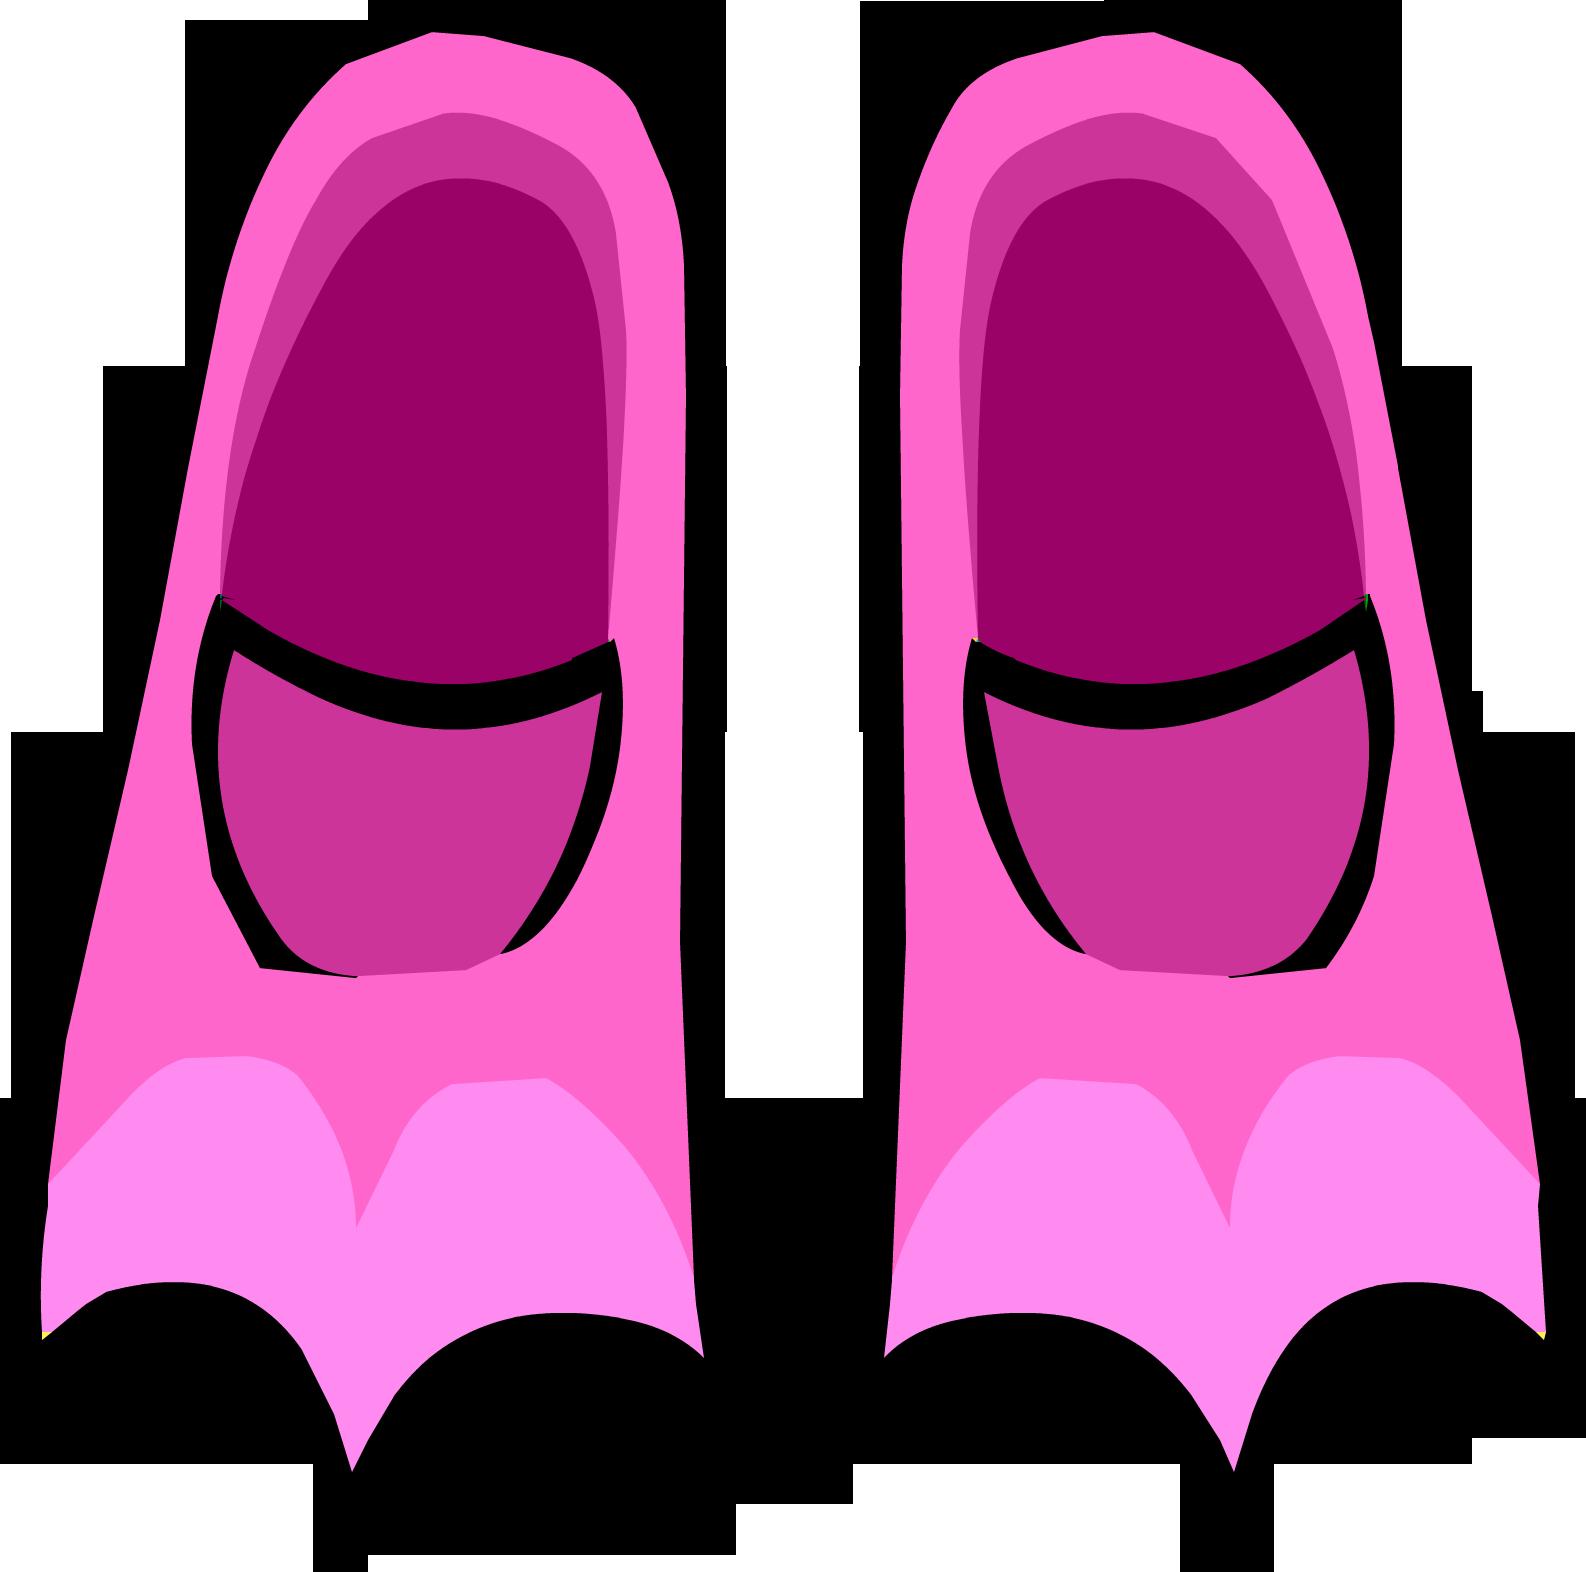 Clipart penquin penguin flipper. Pink flippers club wiki